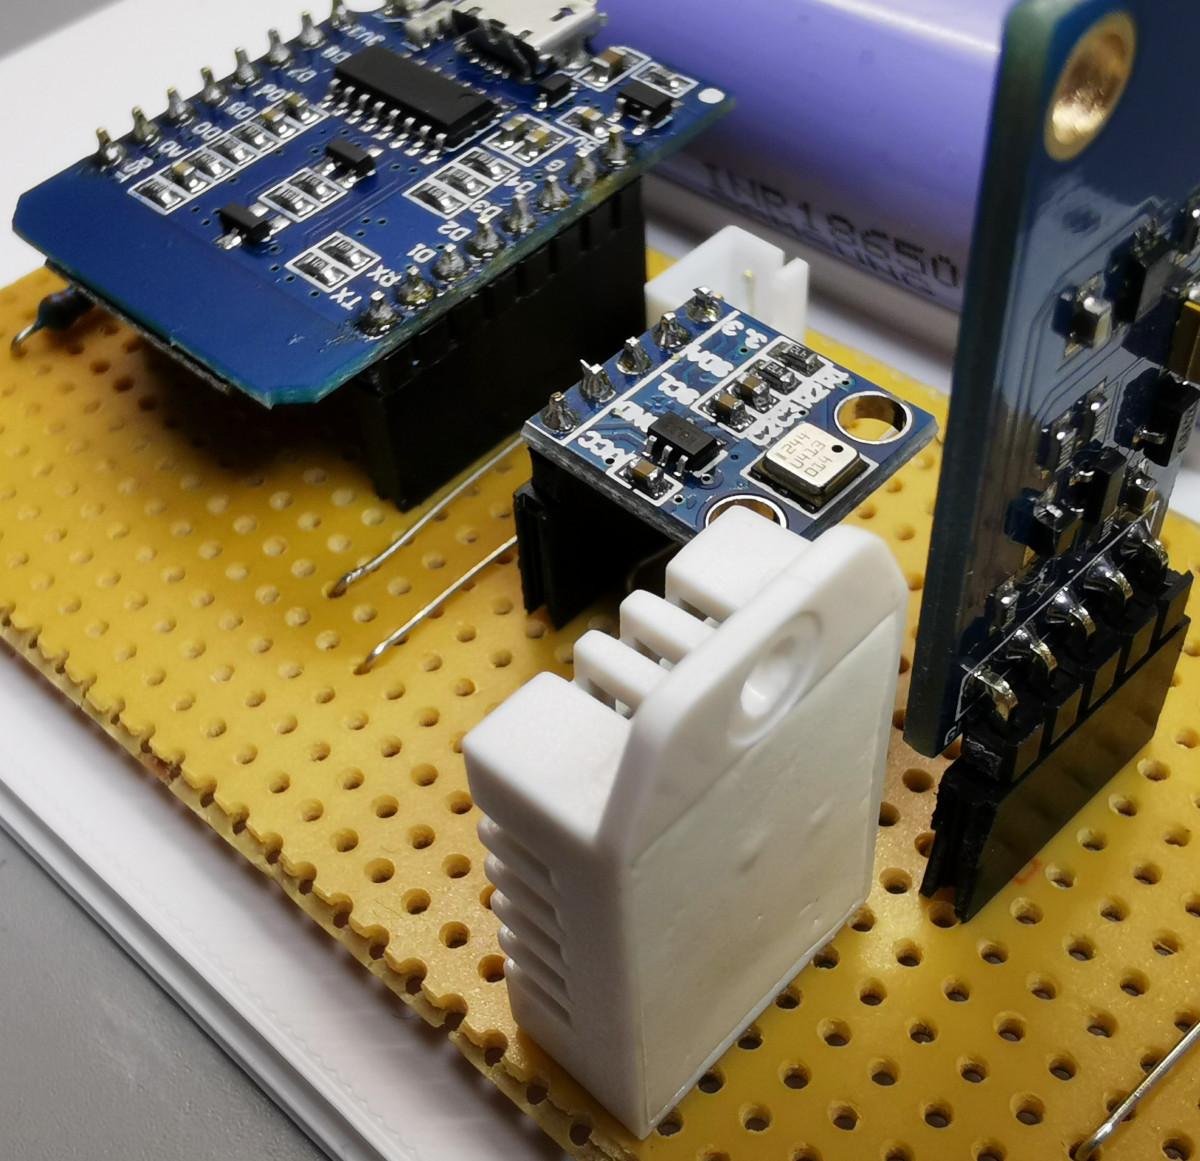 Wireless home sensor network